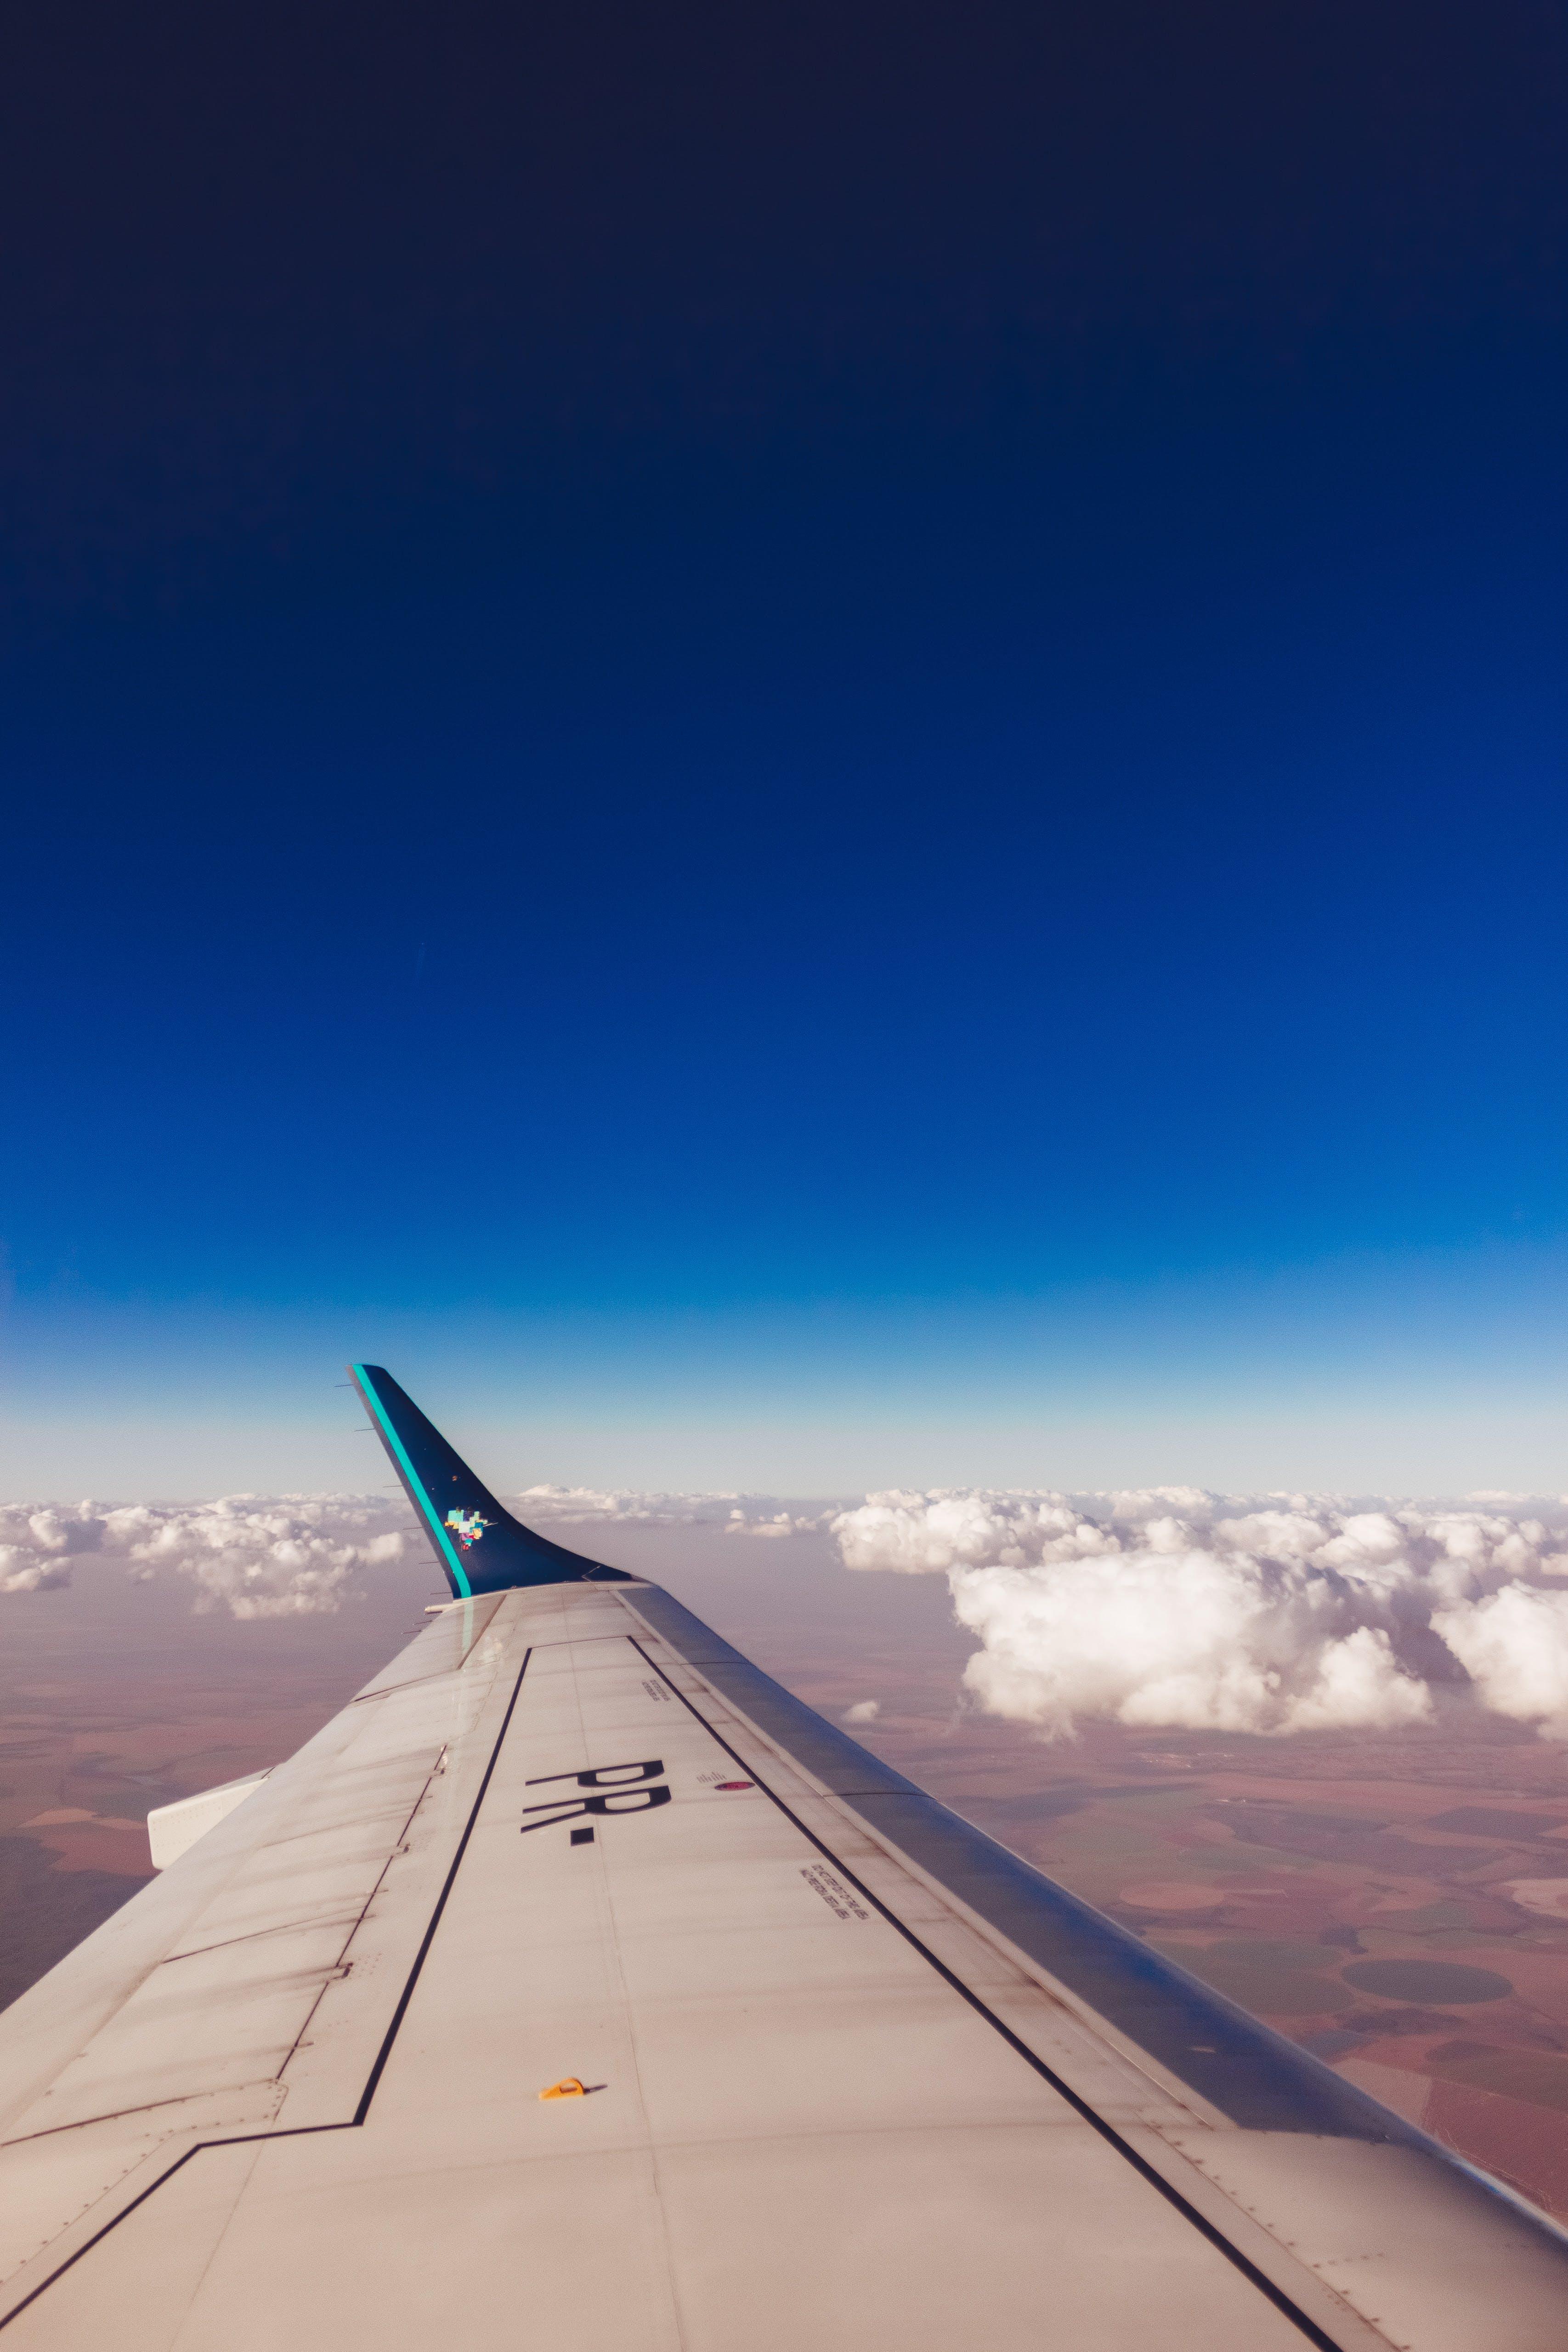 Kostenloses Stock Foto zu flug, himmel, fliegen, wüste